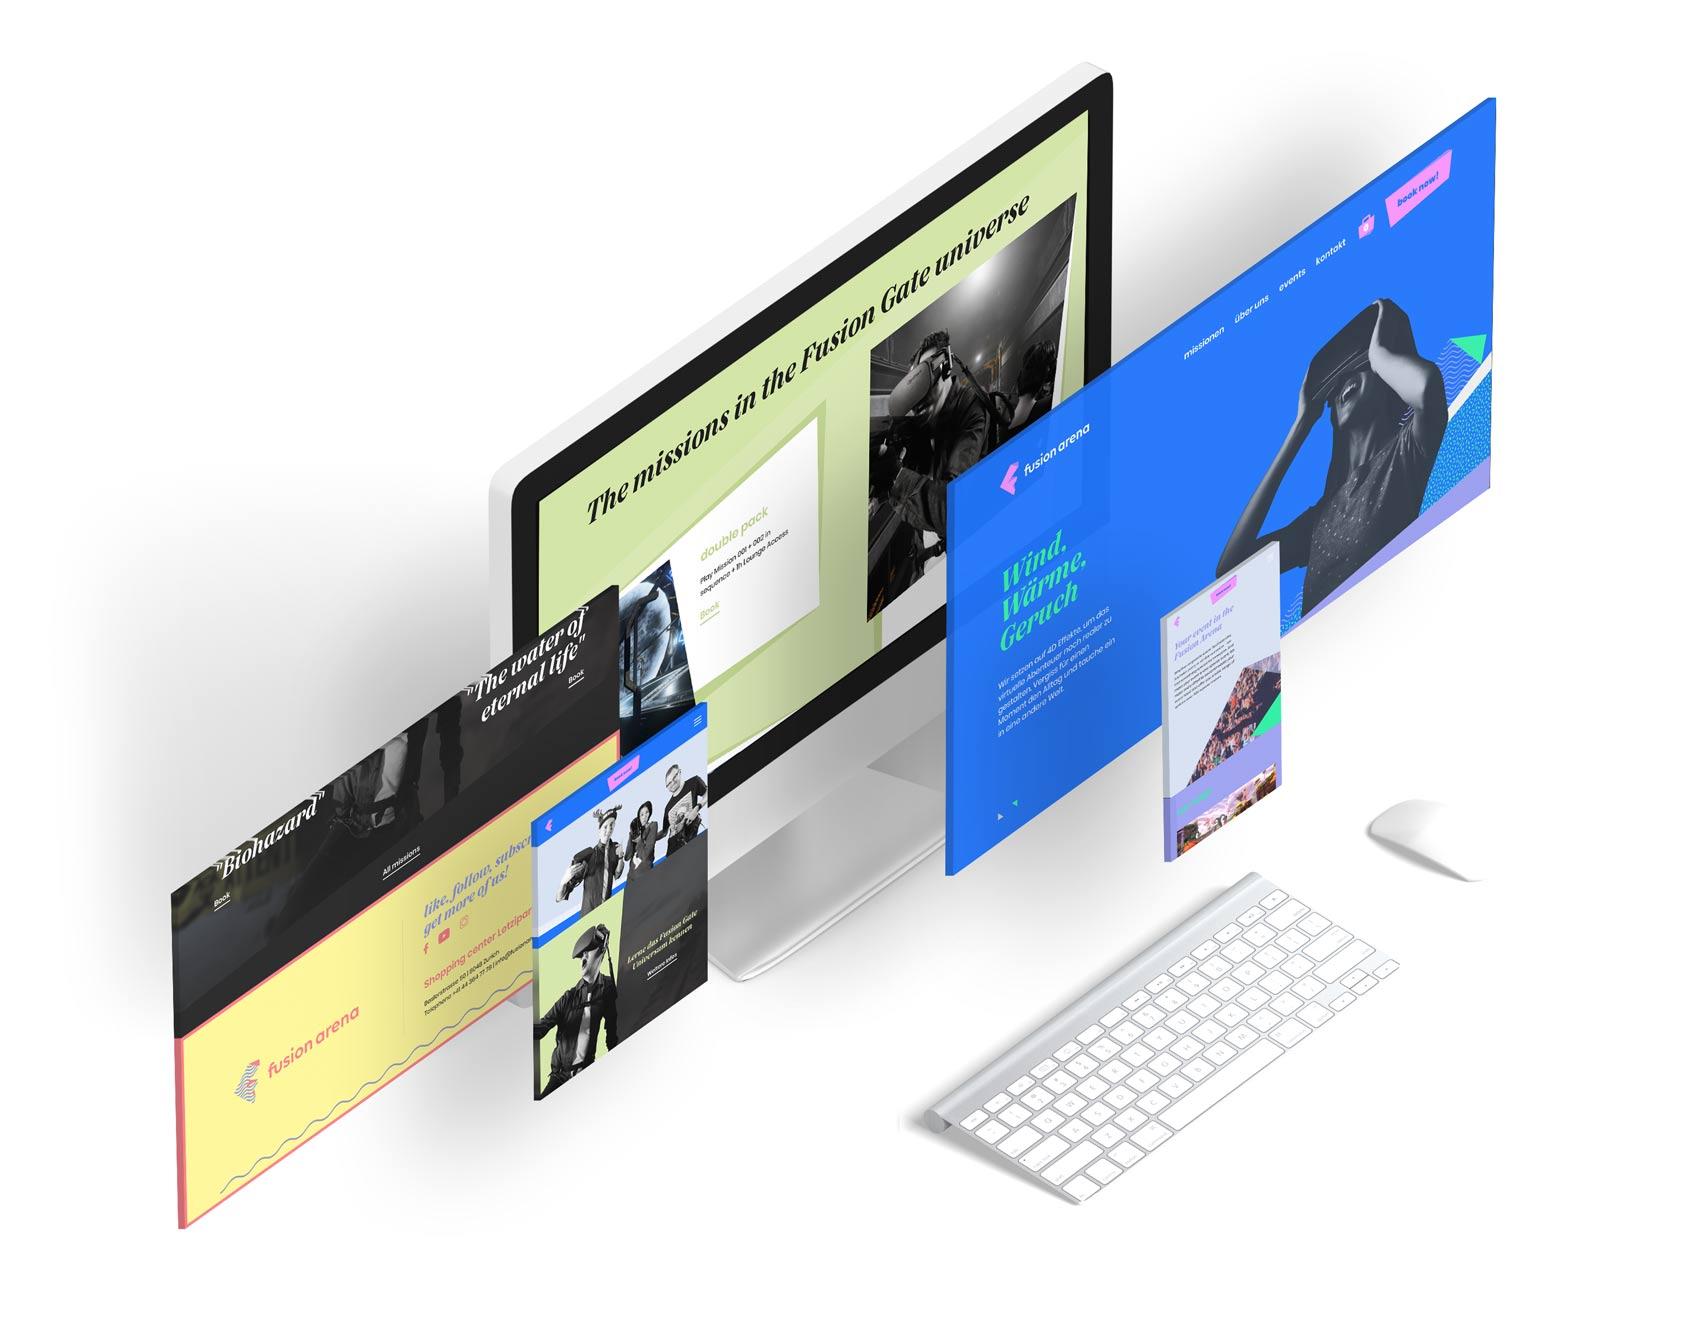 fusion-site.jpg